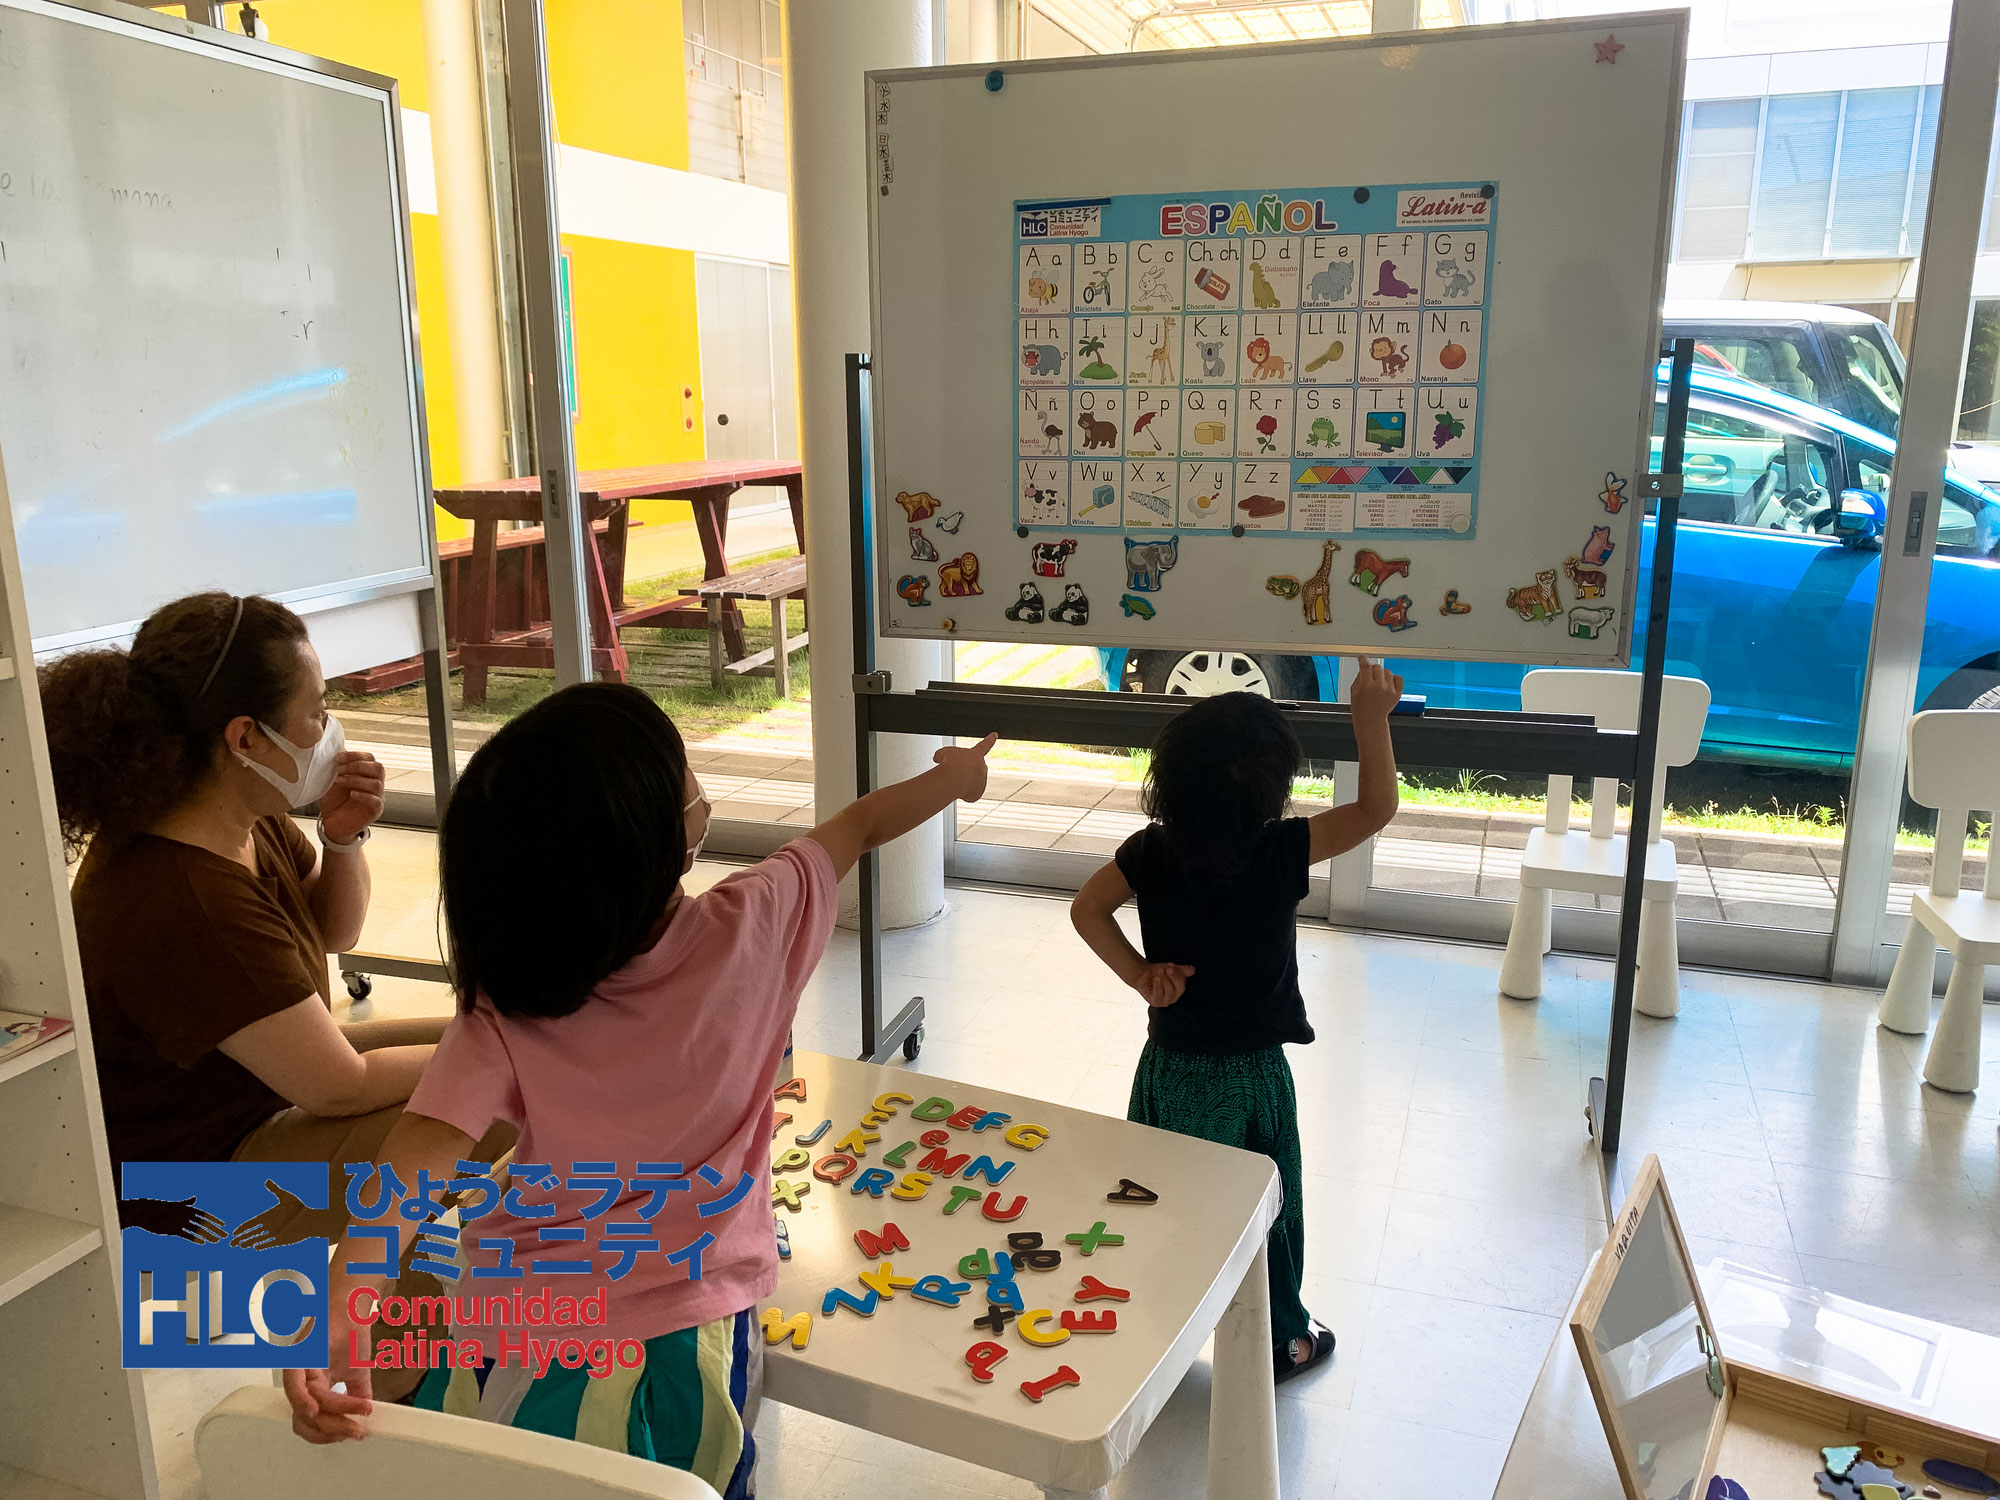 "◆◆Clase de español ""Semillitas"", primera clase de agosto /幼児向けスペイン語教室「Semillitas」の子どもたちが、8月1回目の授業を行いました!◆◆"